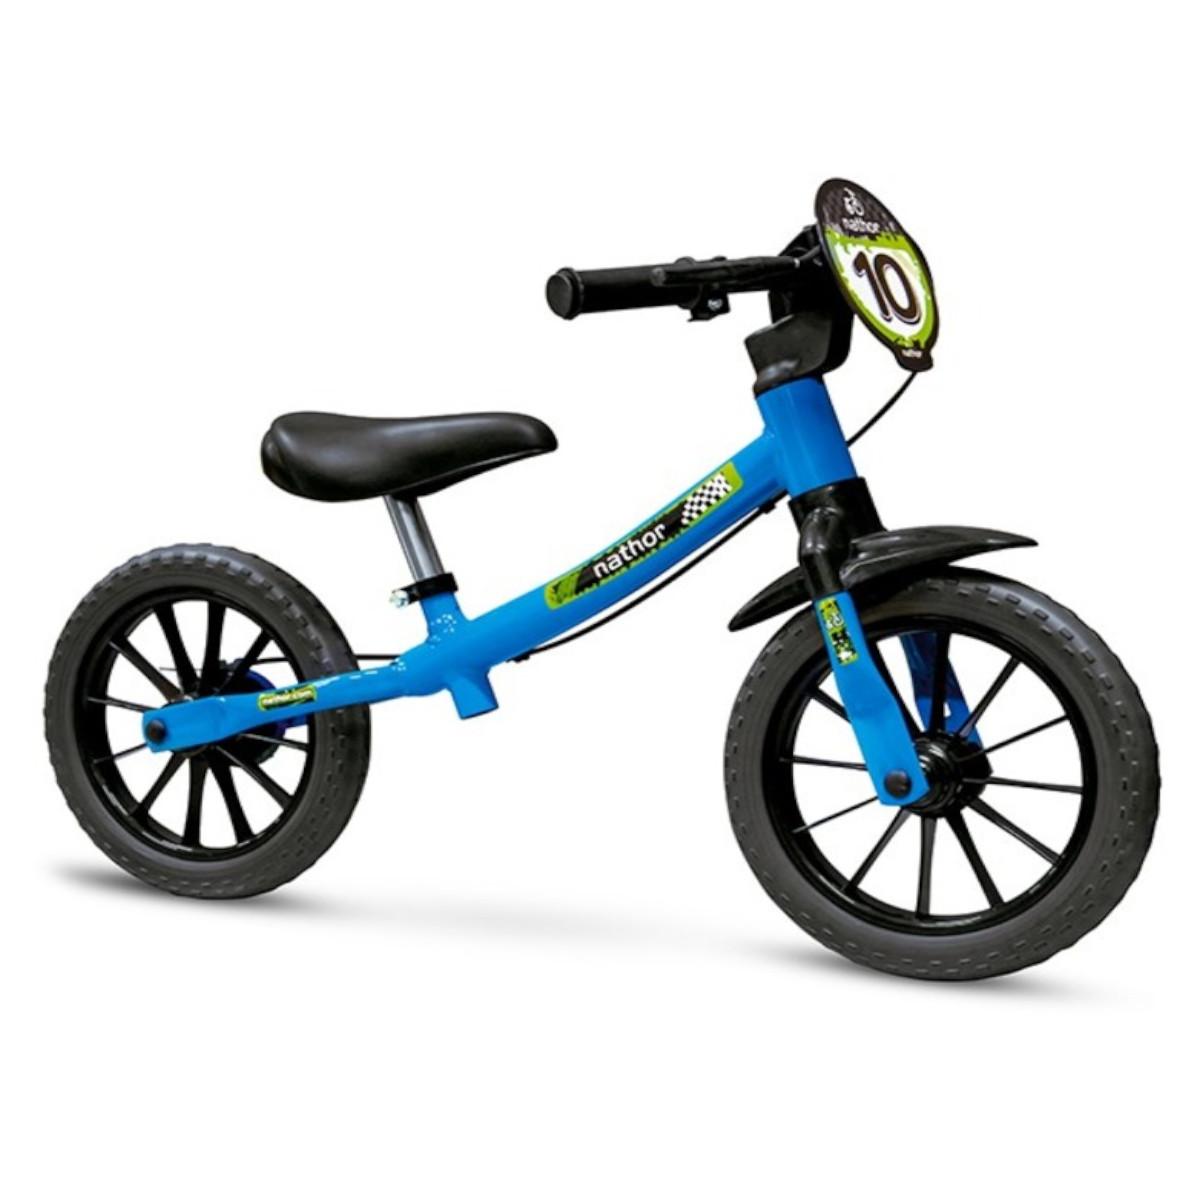 Bicicleta Infantil Nathor Balance Azul Aro 12 Equilíbrio